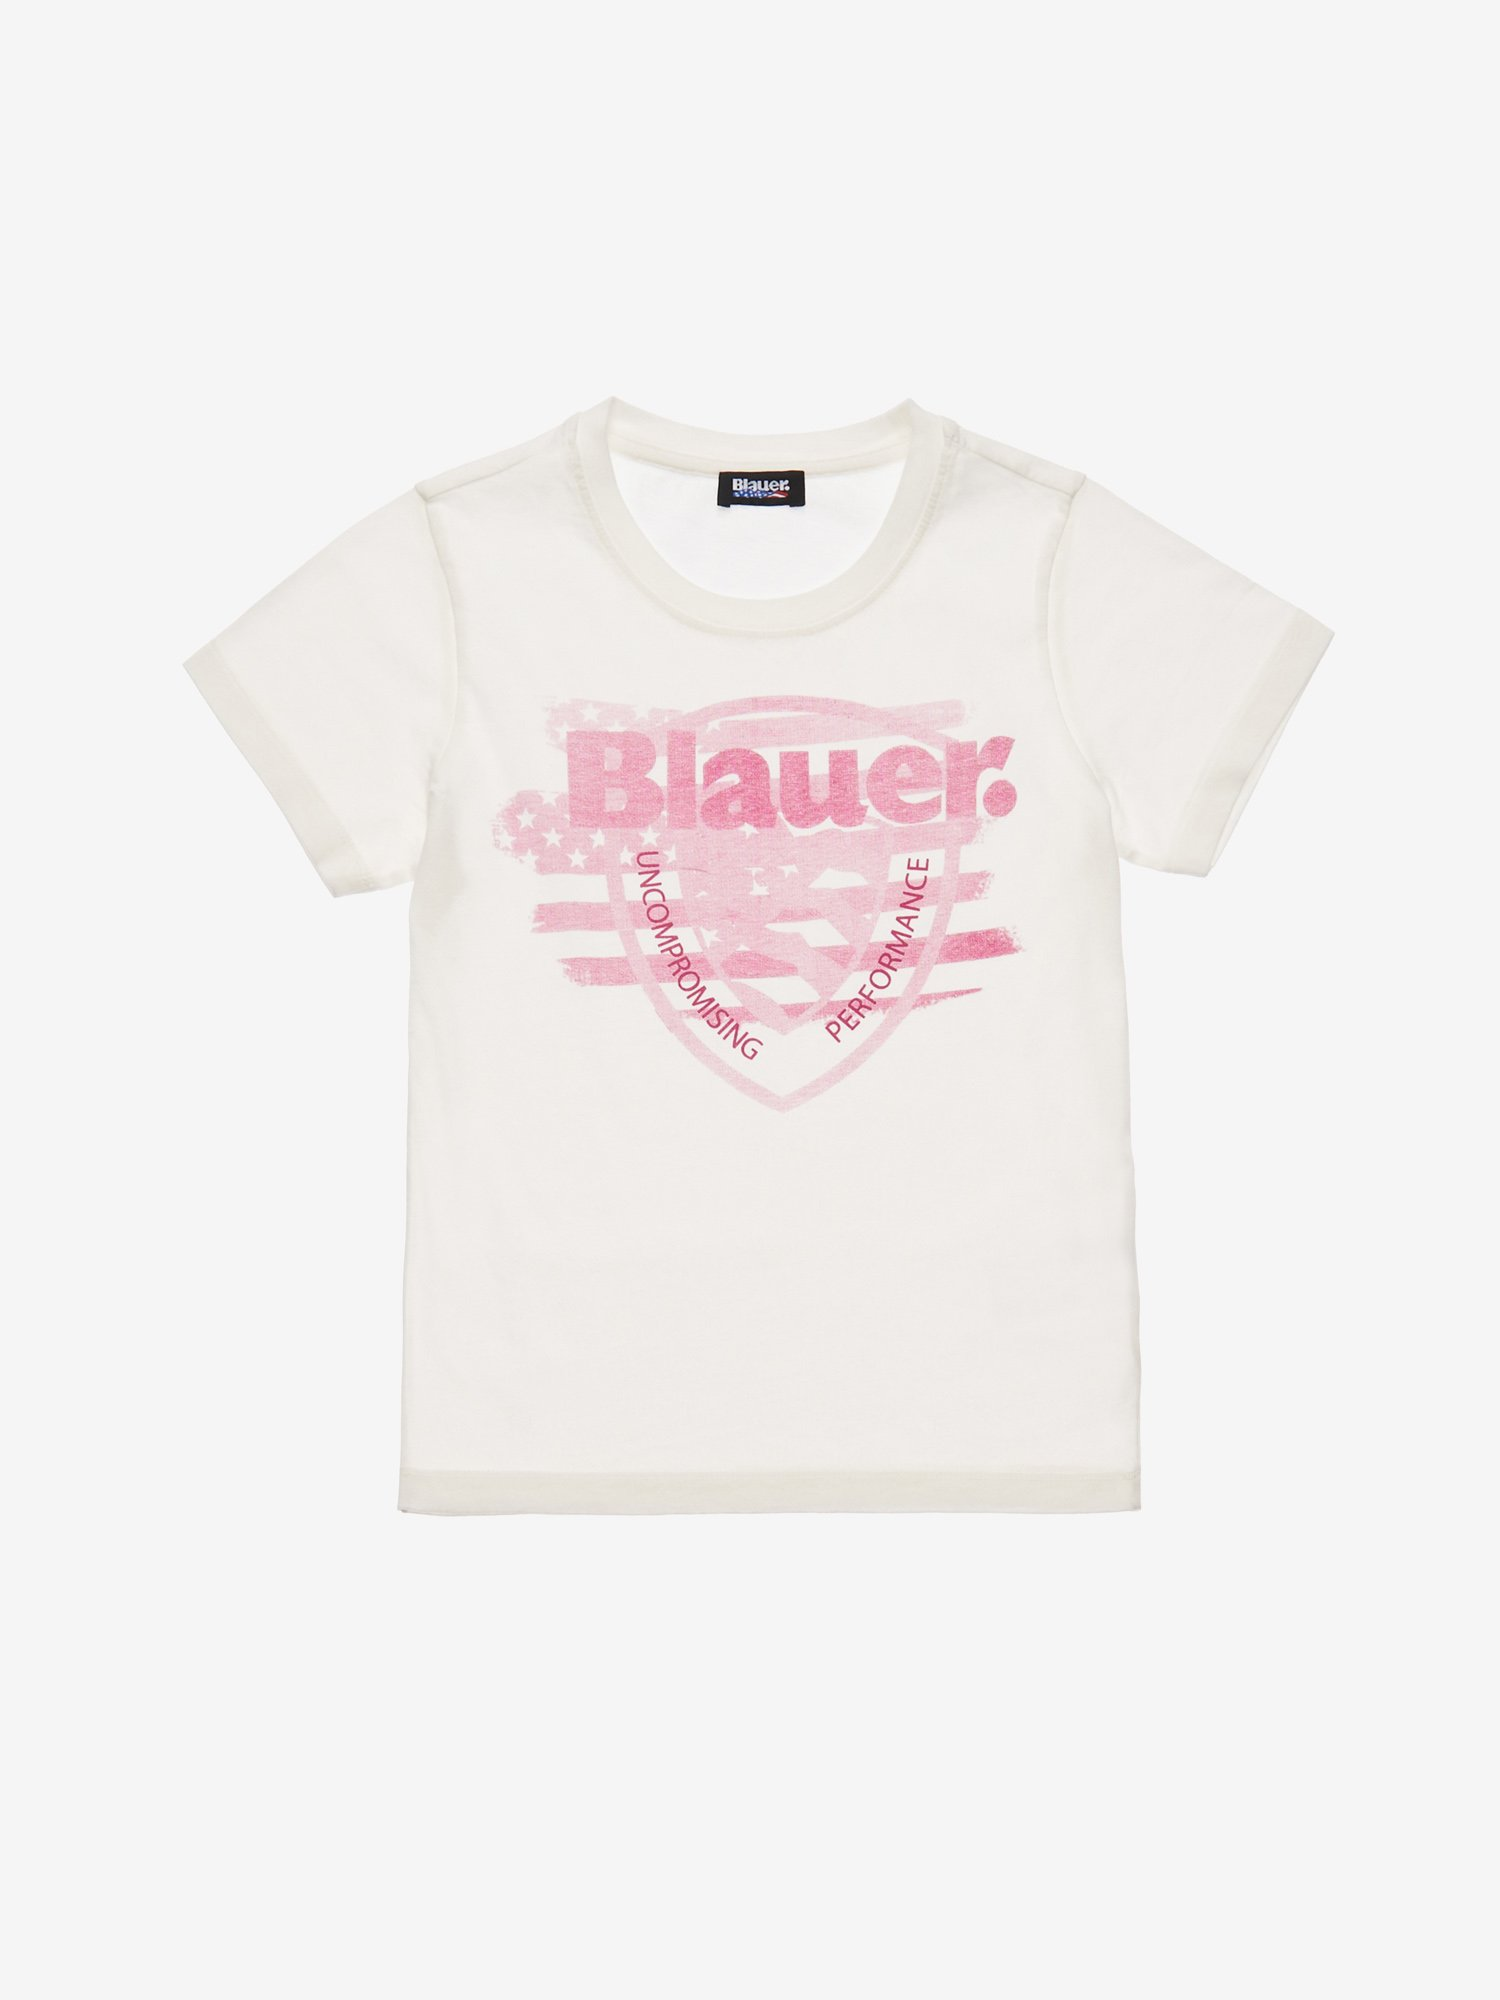 JUNIOR BLAUER USA SHIELD T-SHIRT - Blauer